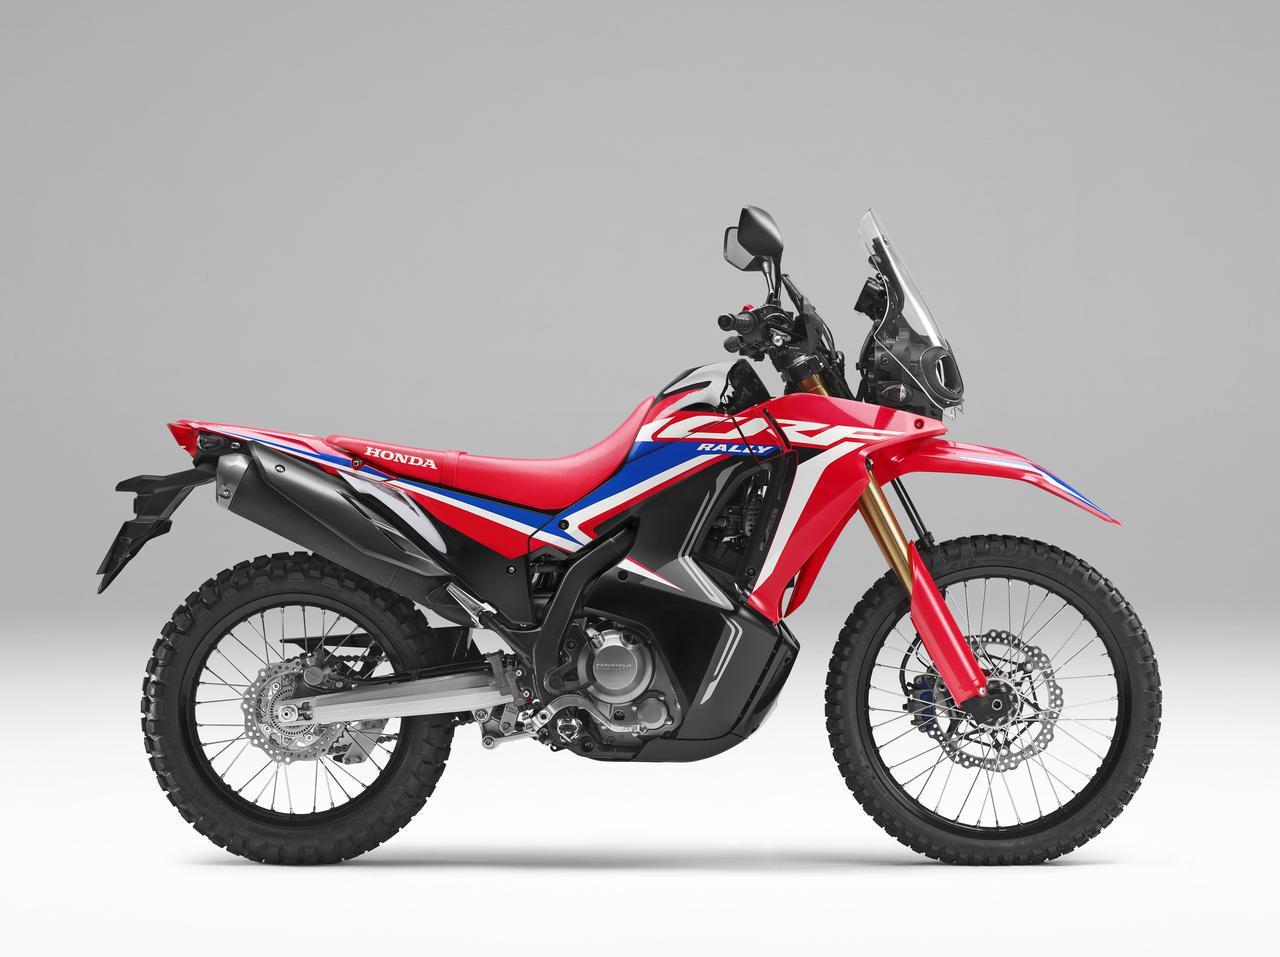 画像2: Honda CRF250L ¥599,500 CRF250L<s> ¥599,500